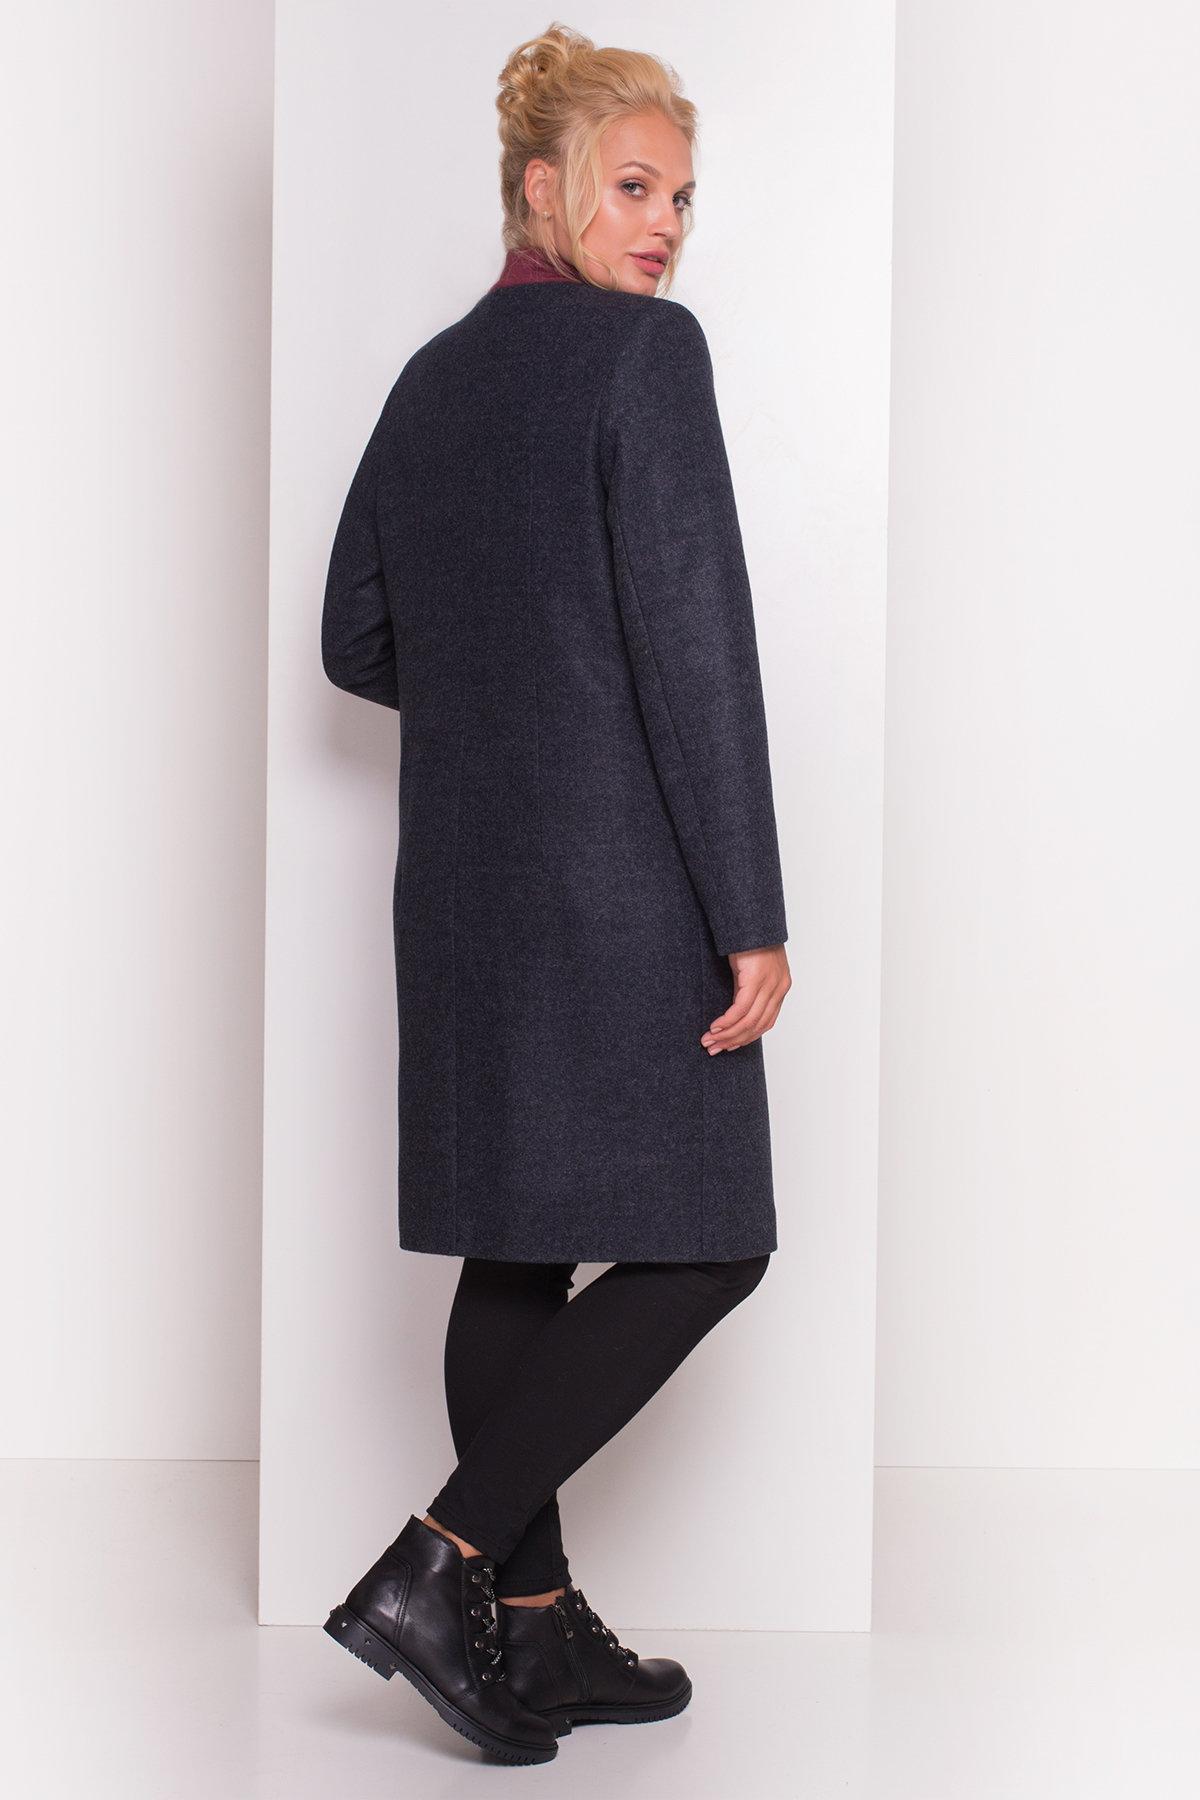 Пальто Фортуна лайт Donna 4464 АРТ. 21360 Цвет: Темно-синий - фото 4, интернет магазин tm-modus.ru